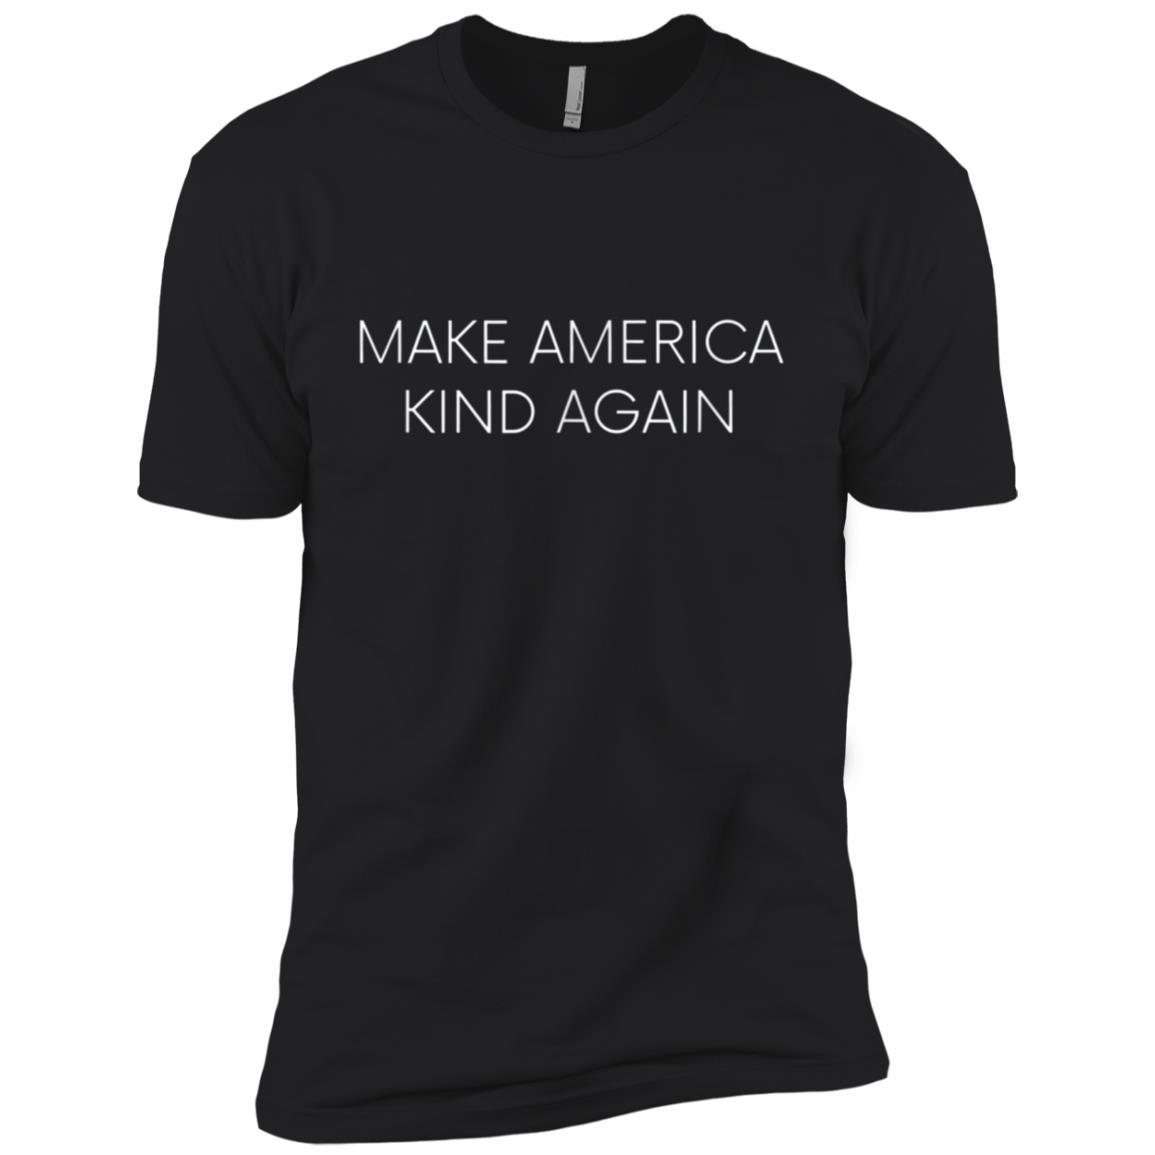 Make America kind again -2 Men Short Sleeve T-Shirt